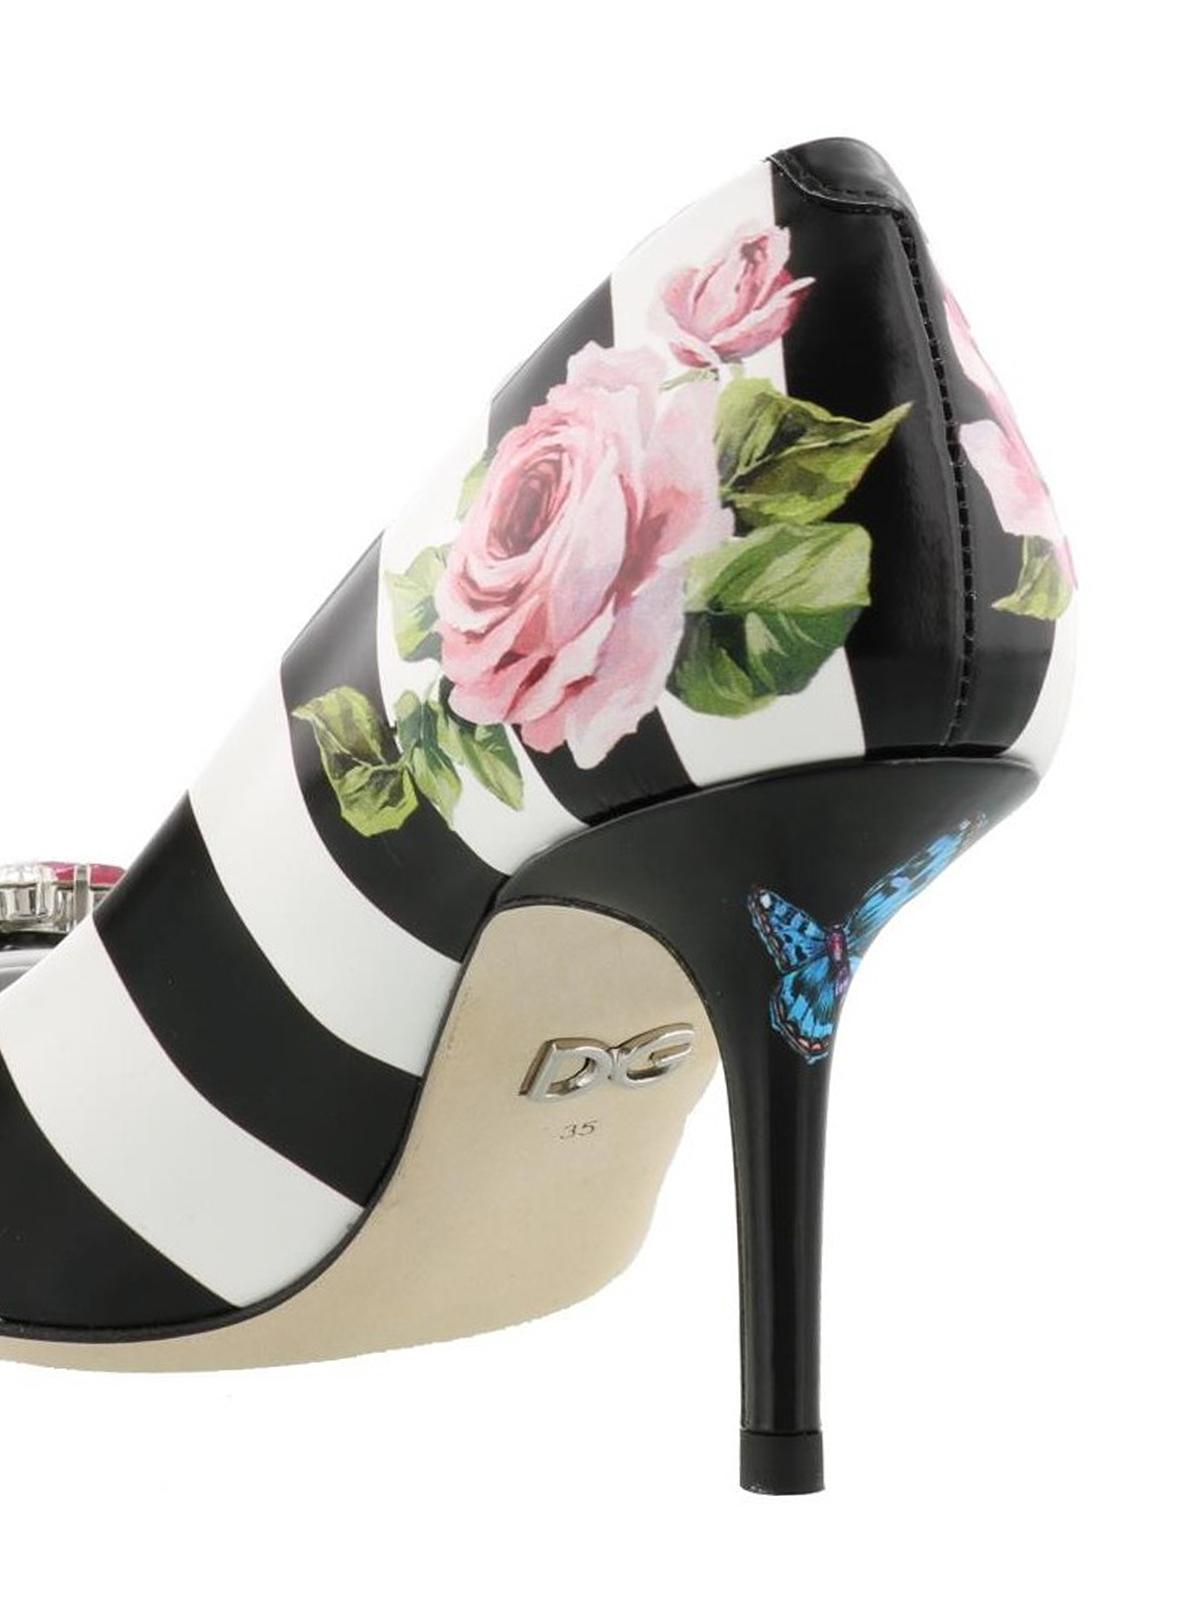 d902e6c1b73b Dolce   Gabbana - Rose print striped leather pumps - court shoes ...